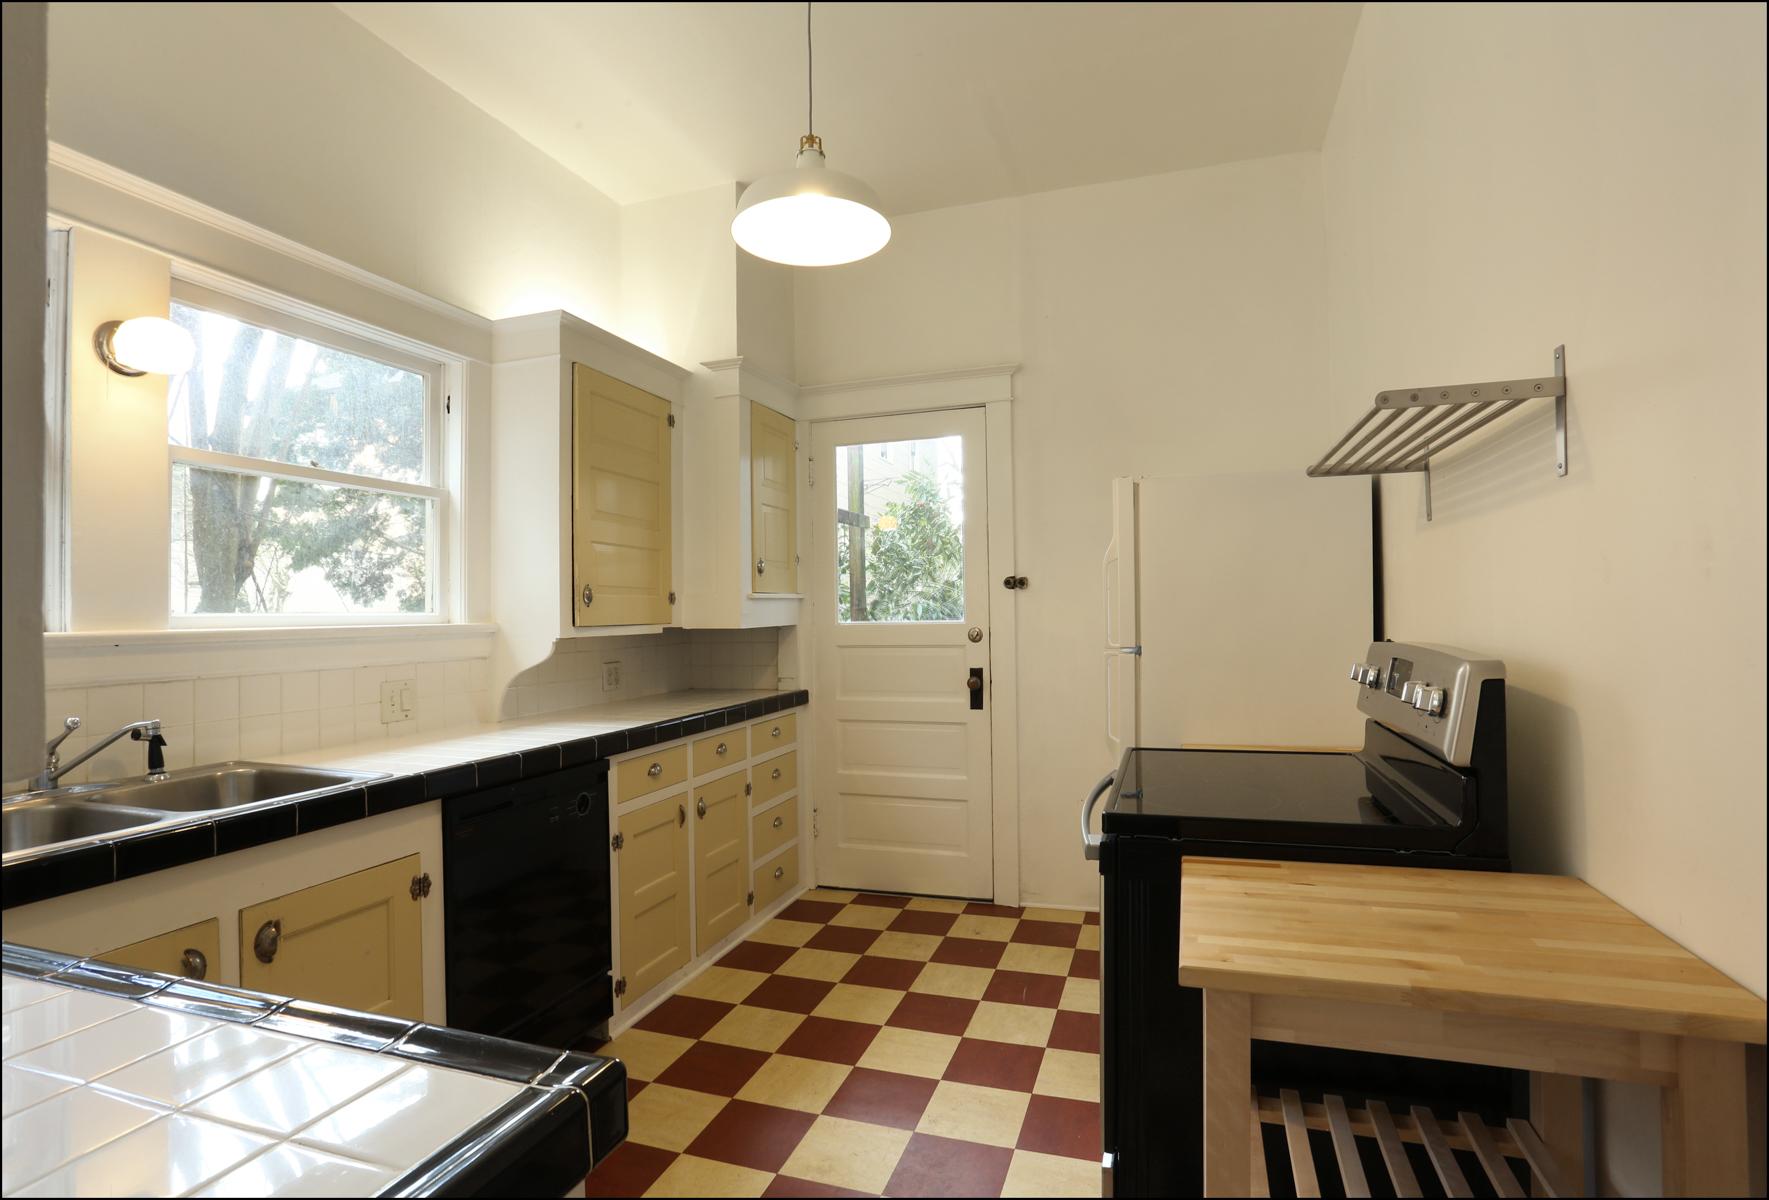 First floor kitchen - door leads to back yard.